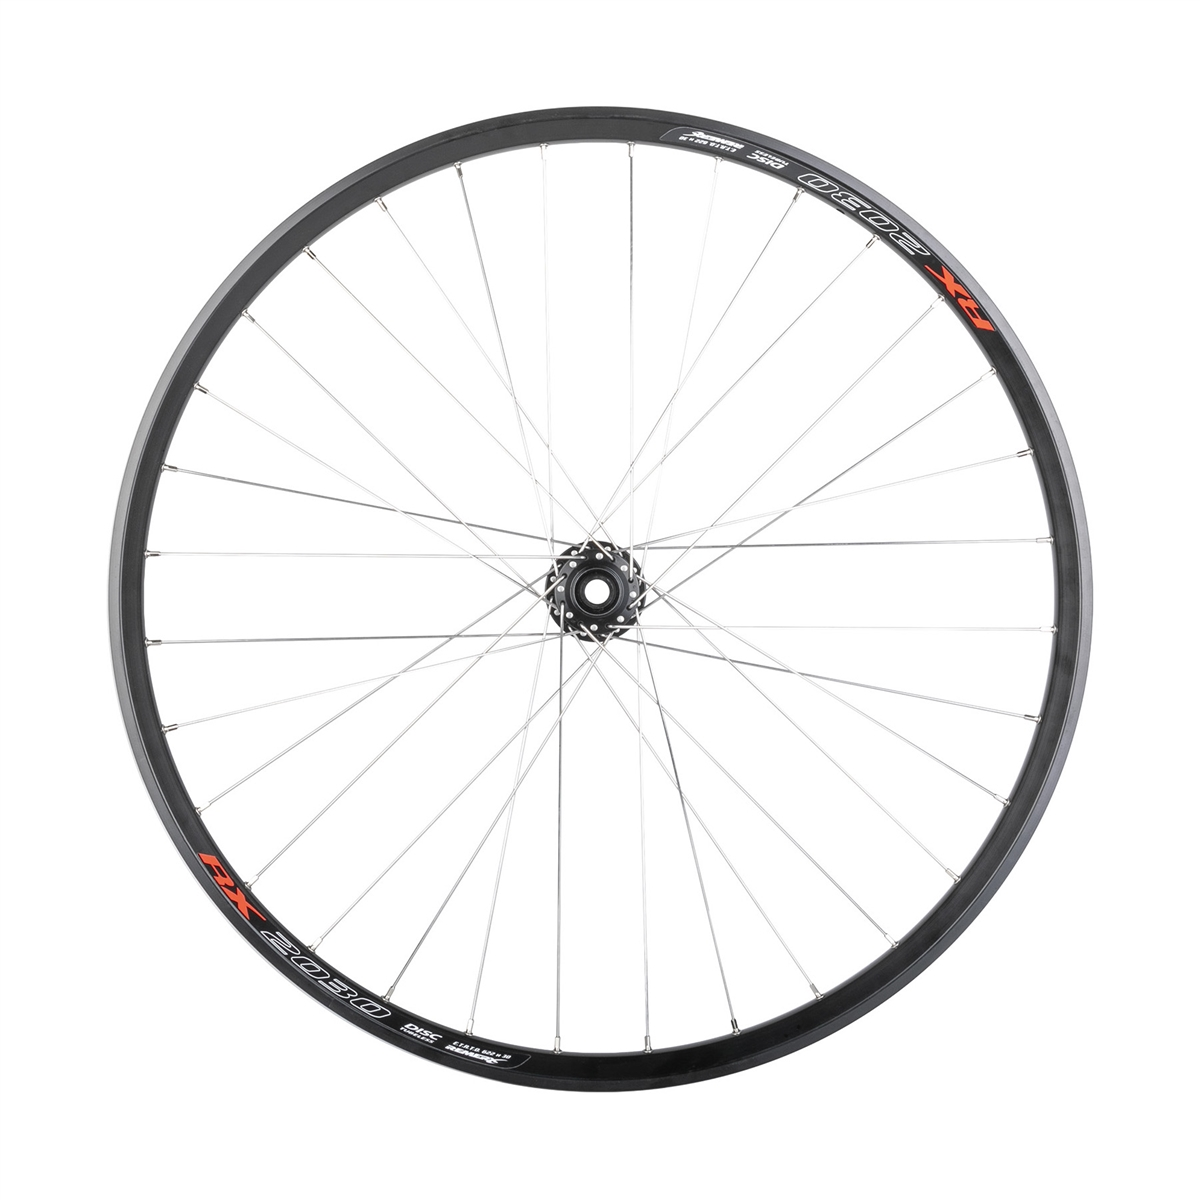 Front Wheel E-Bike 4.30 29'' 32H 110mm Boost Disck Brake Black